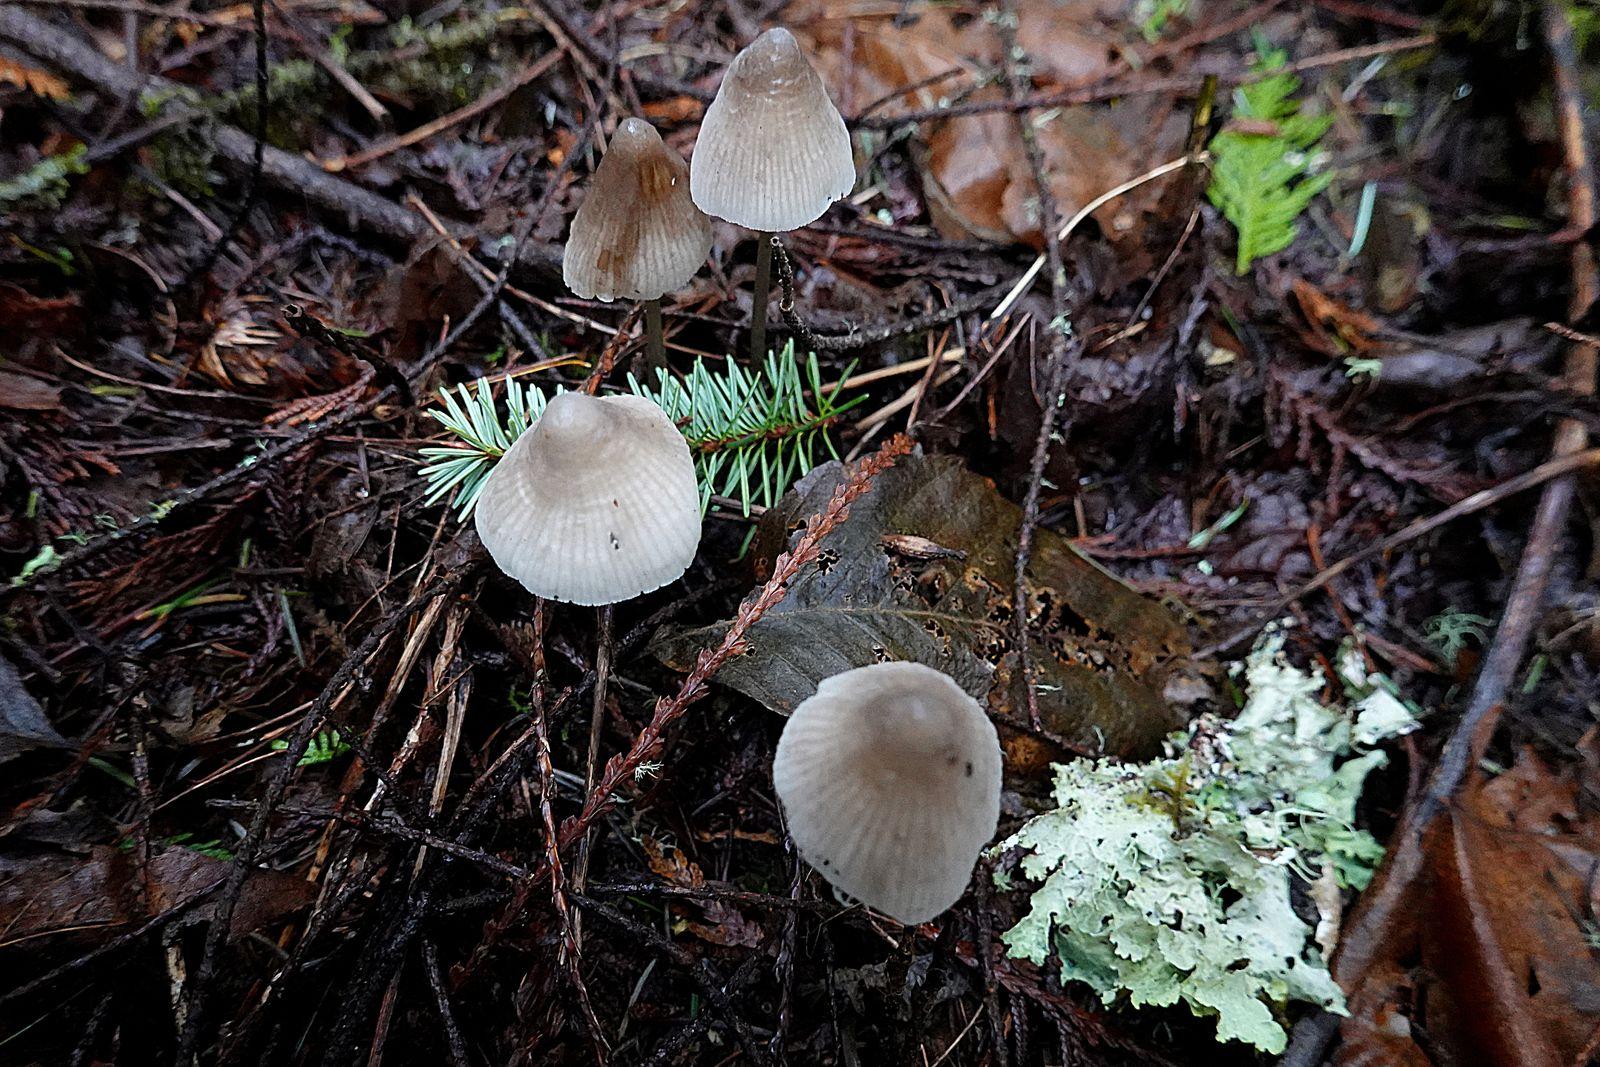 A pretty little clump of mushrooms